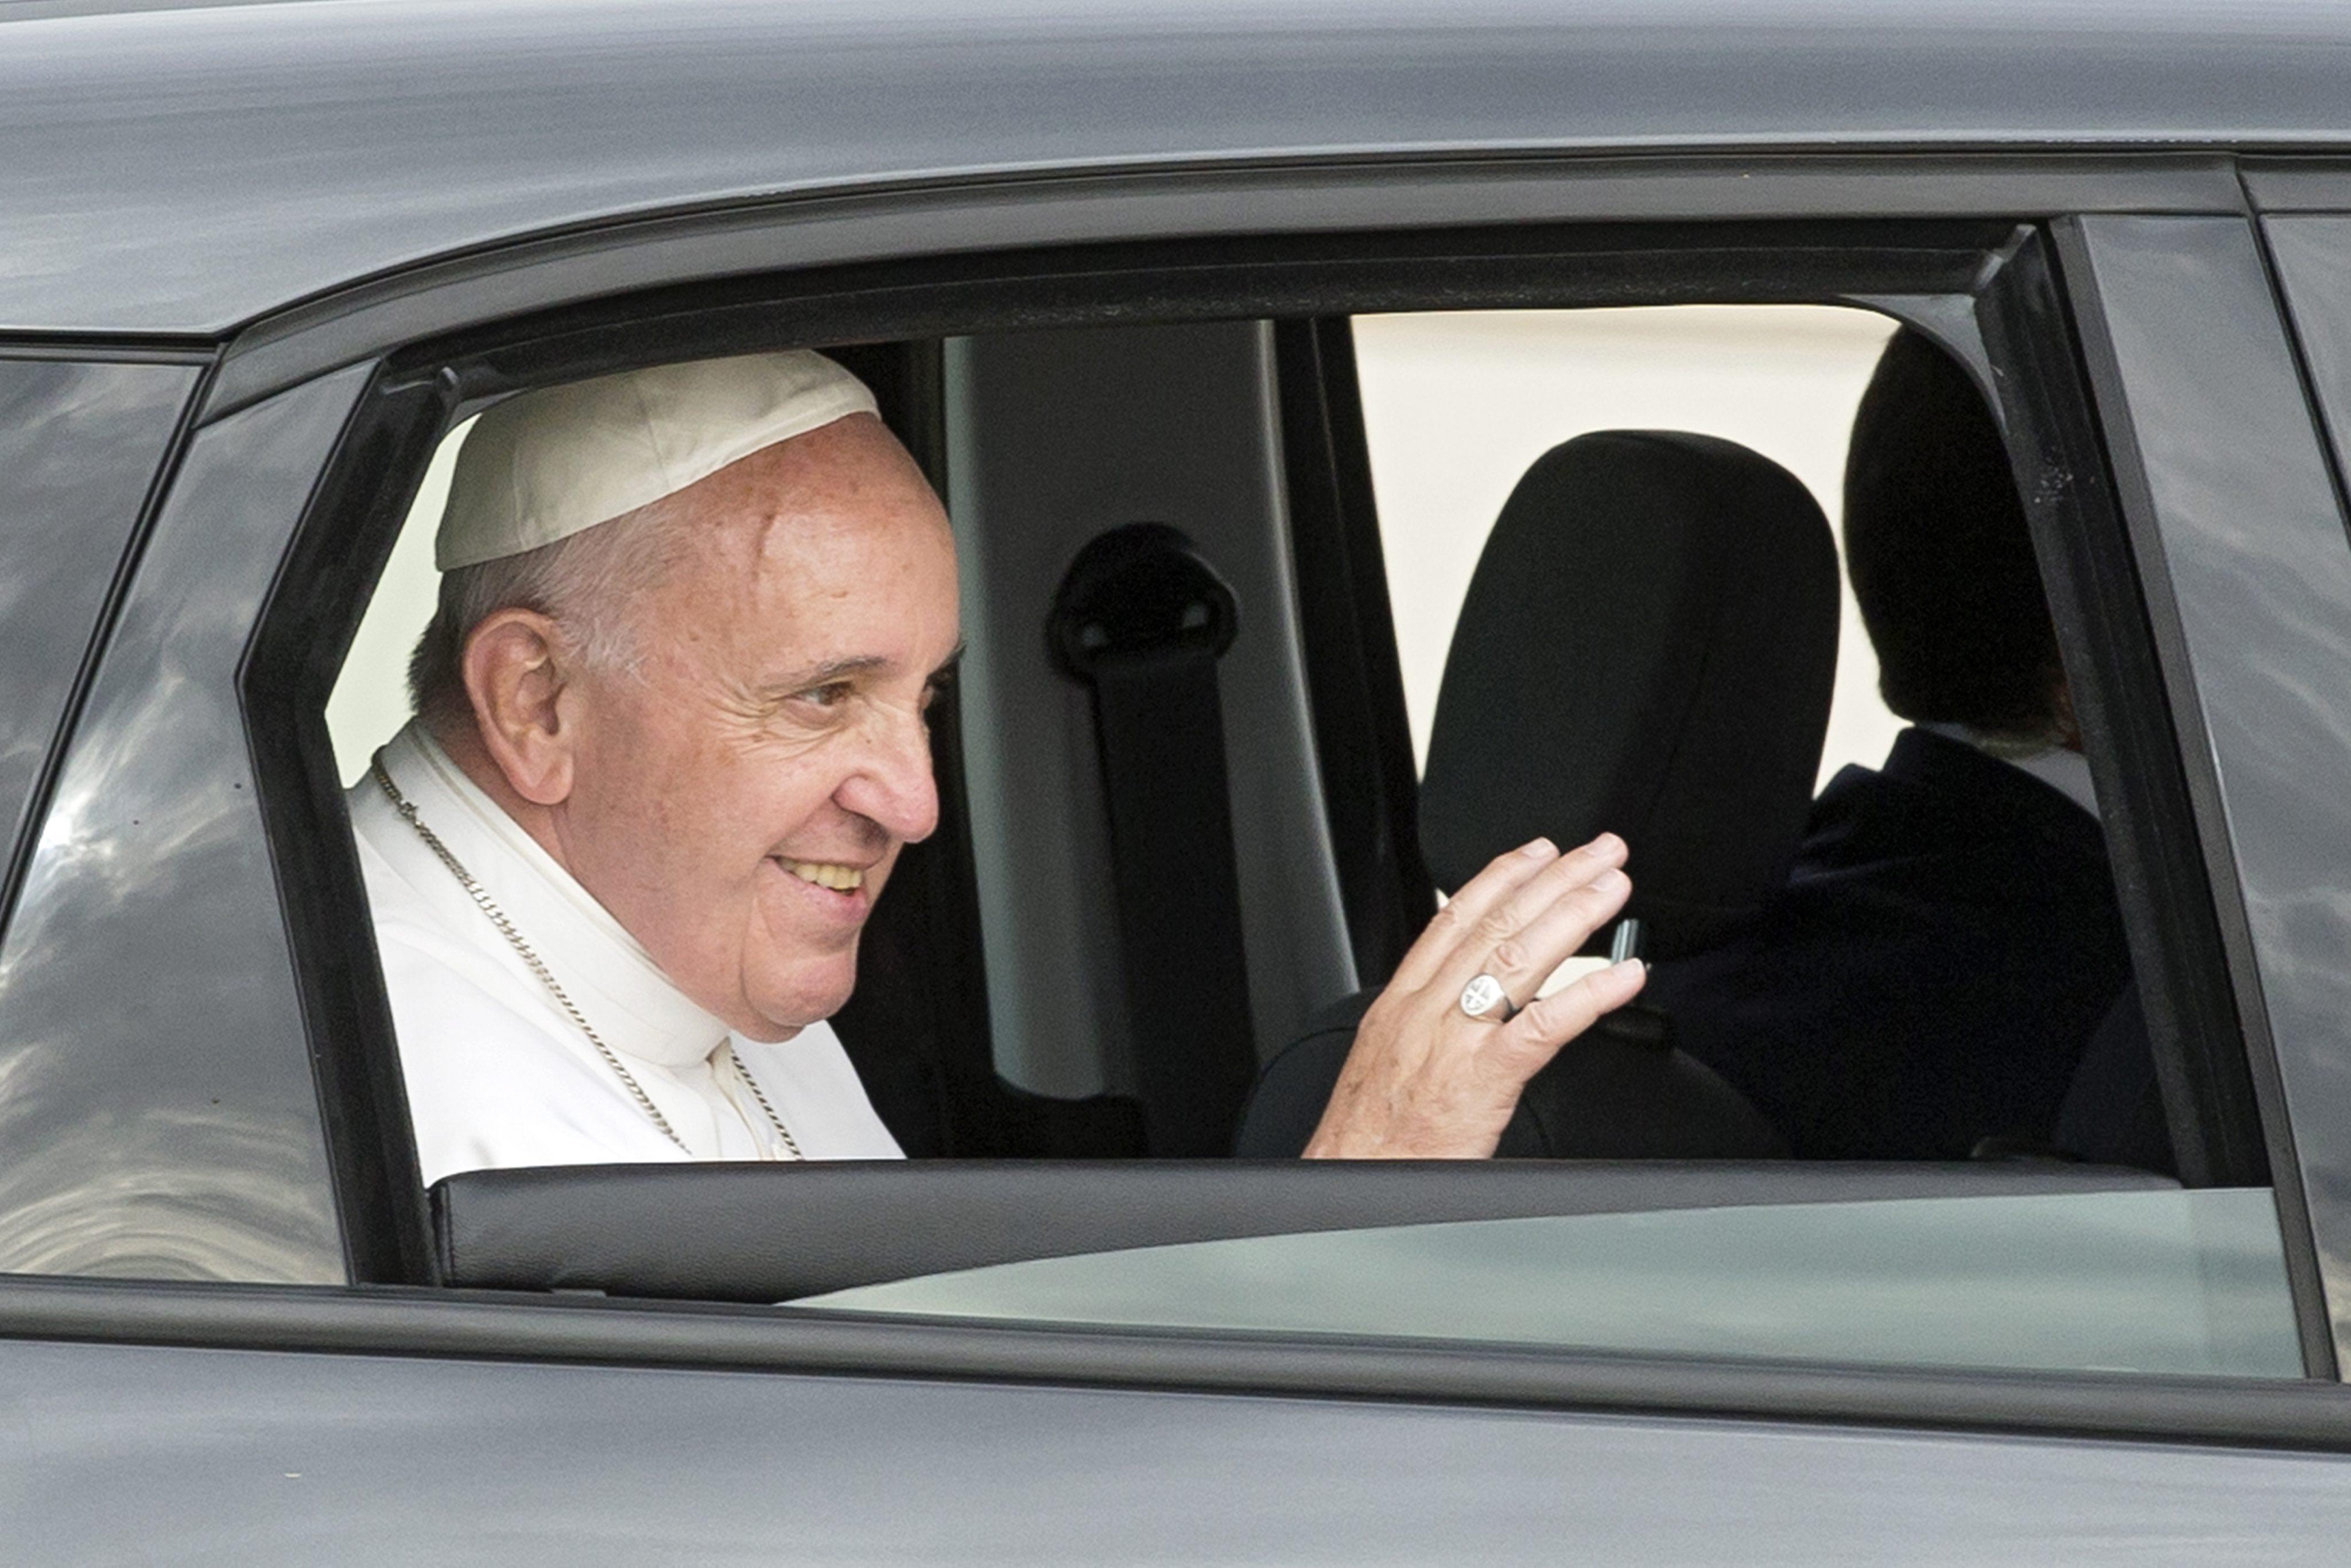 Kogelvrij glas? Nee hoor, gewoon het raam omlaag voor Paus Franciscus. Foto: EPA